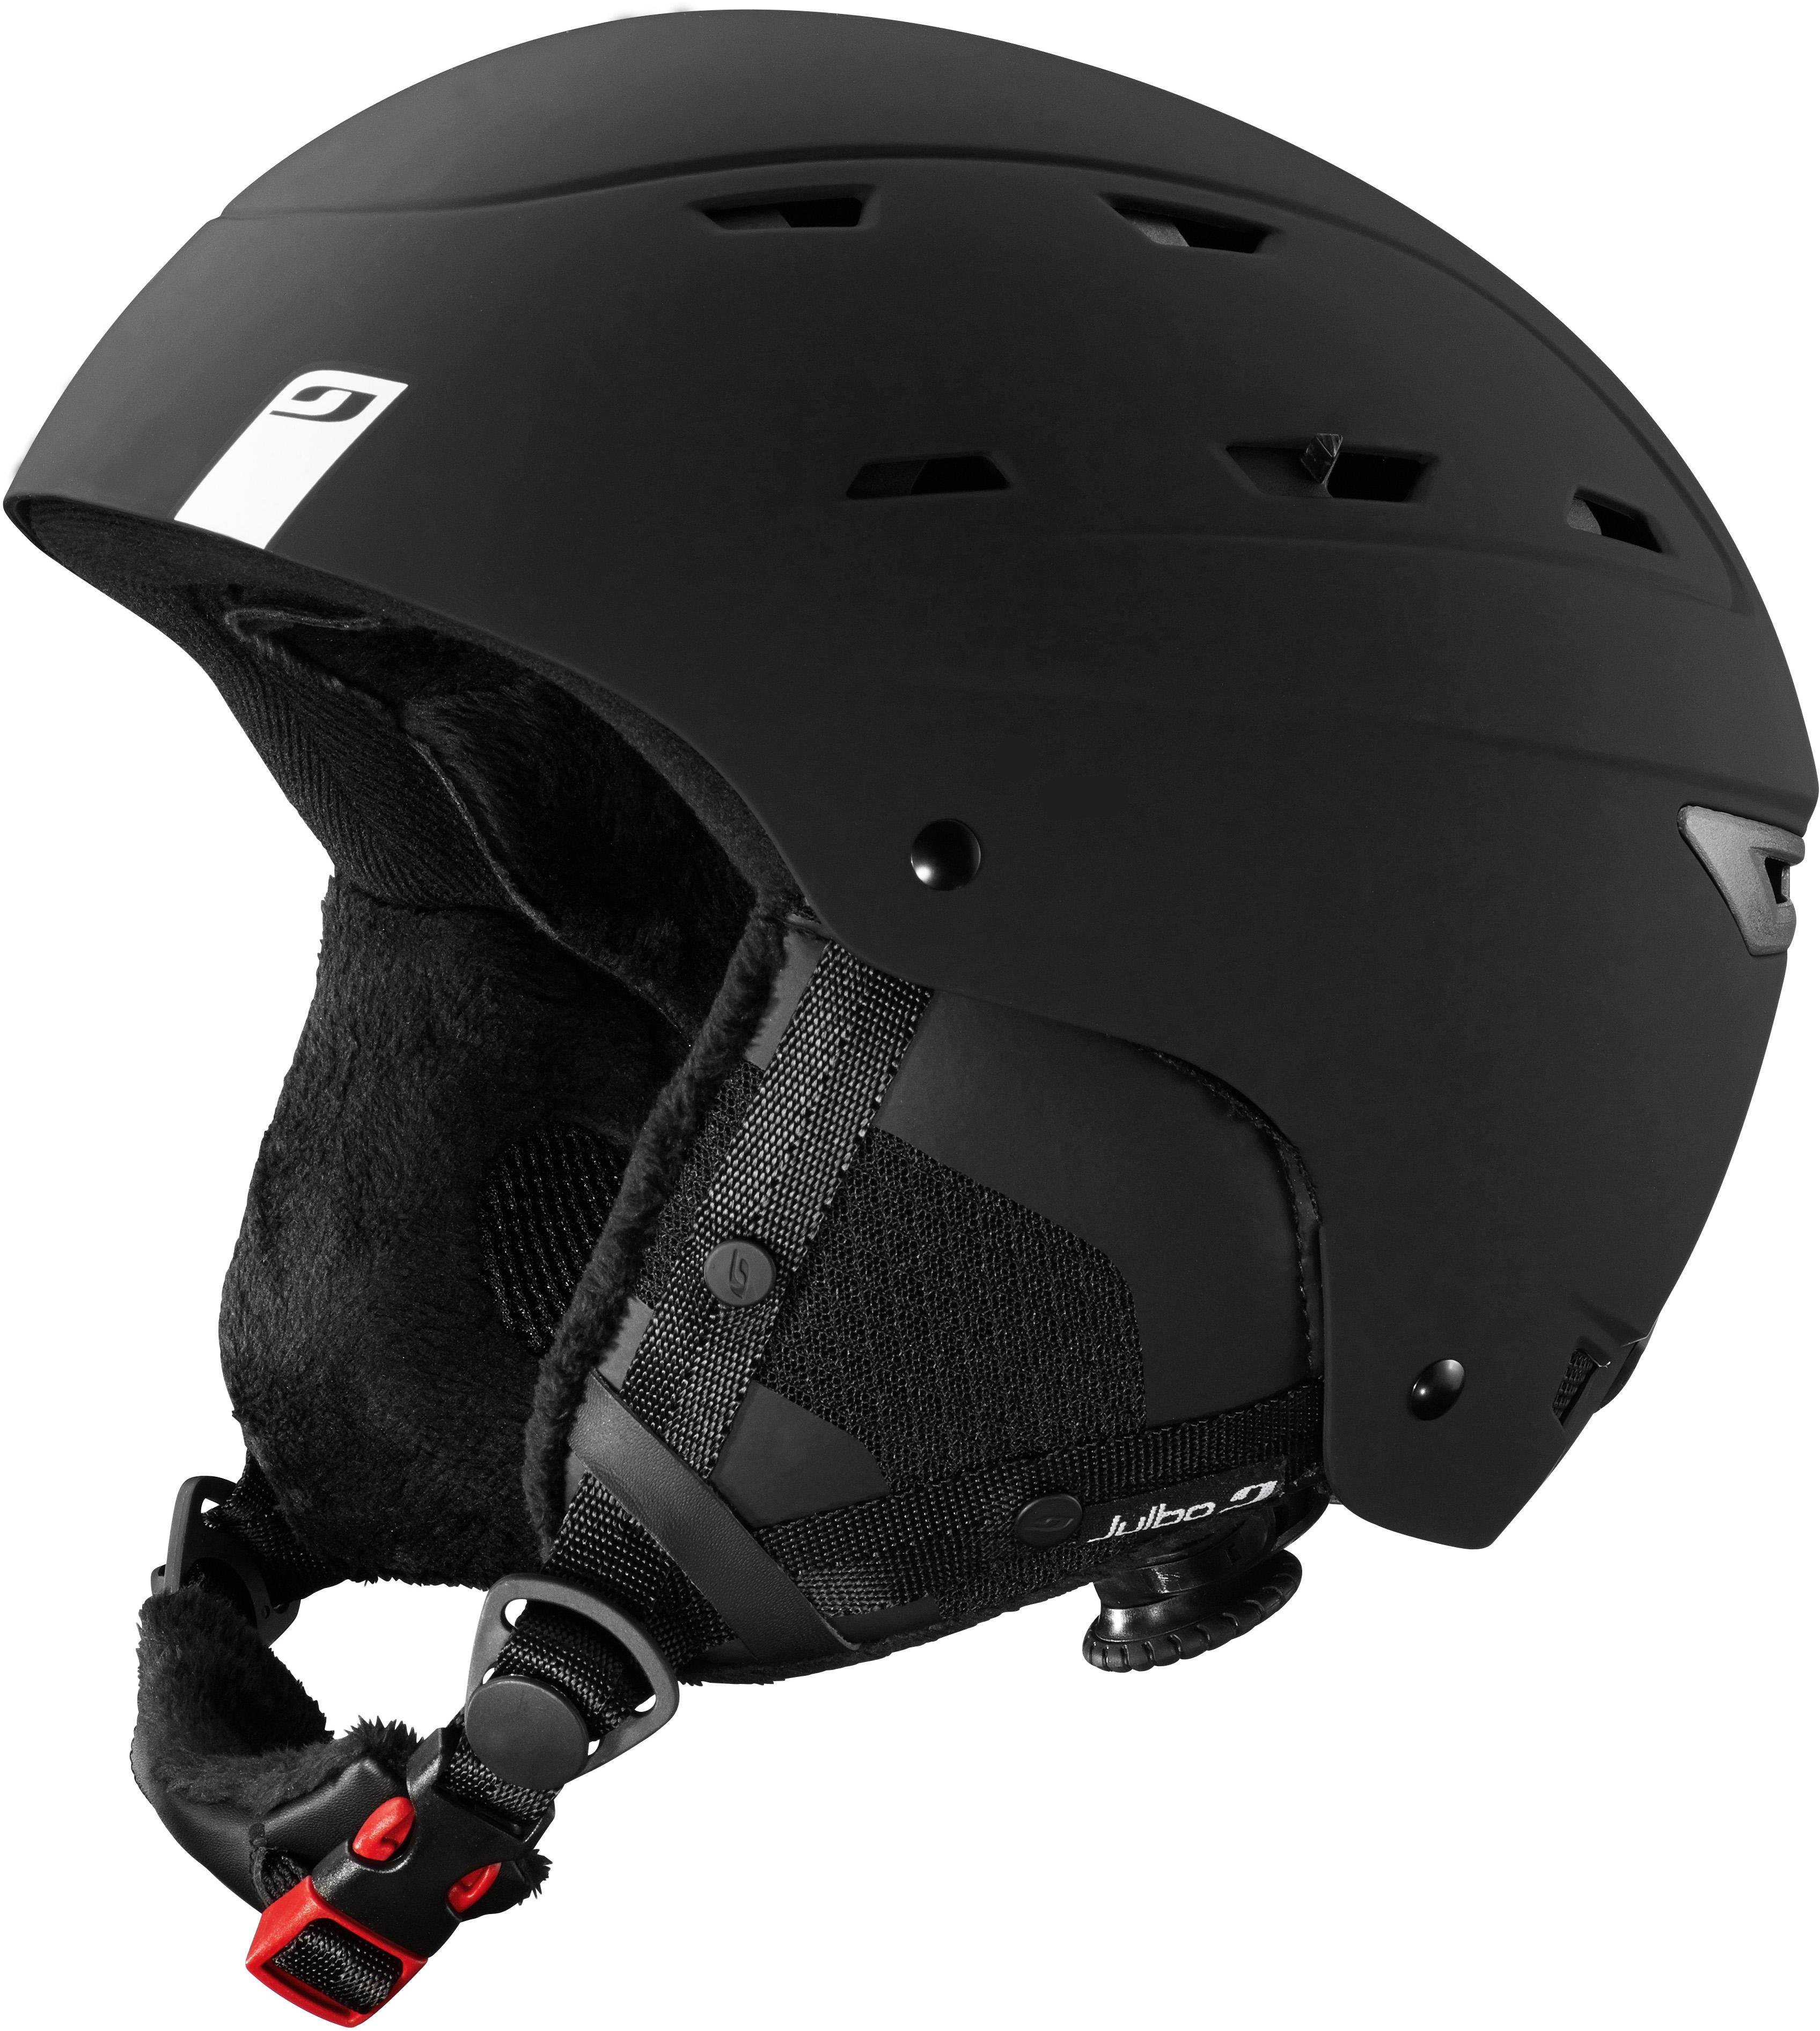 Julbo - Norby - Ski helmet